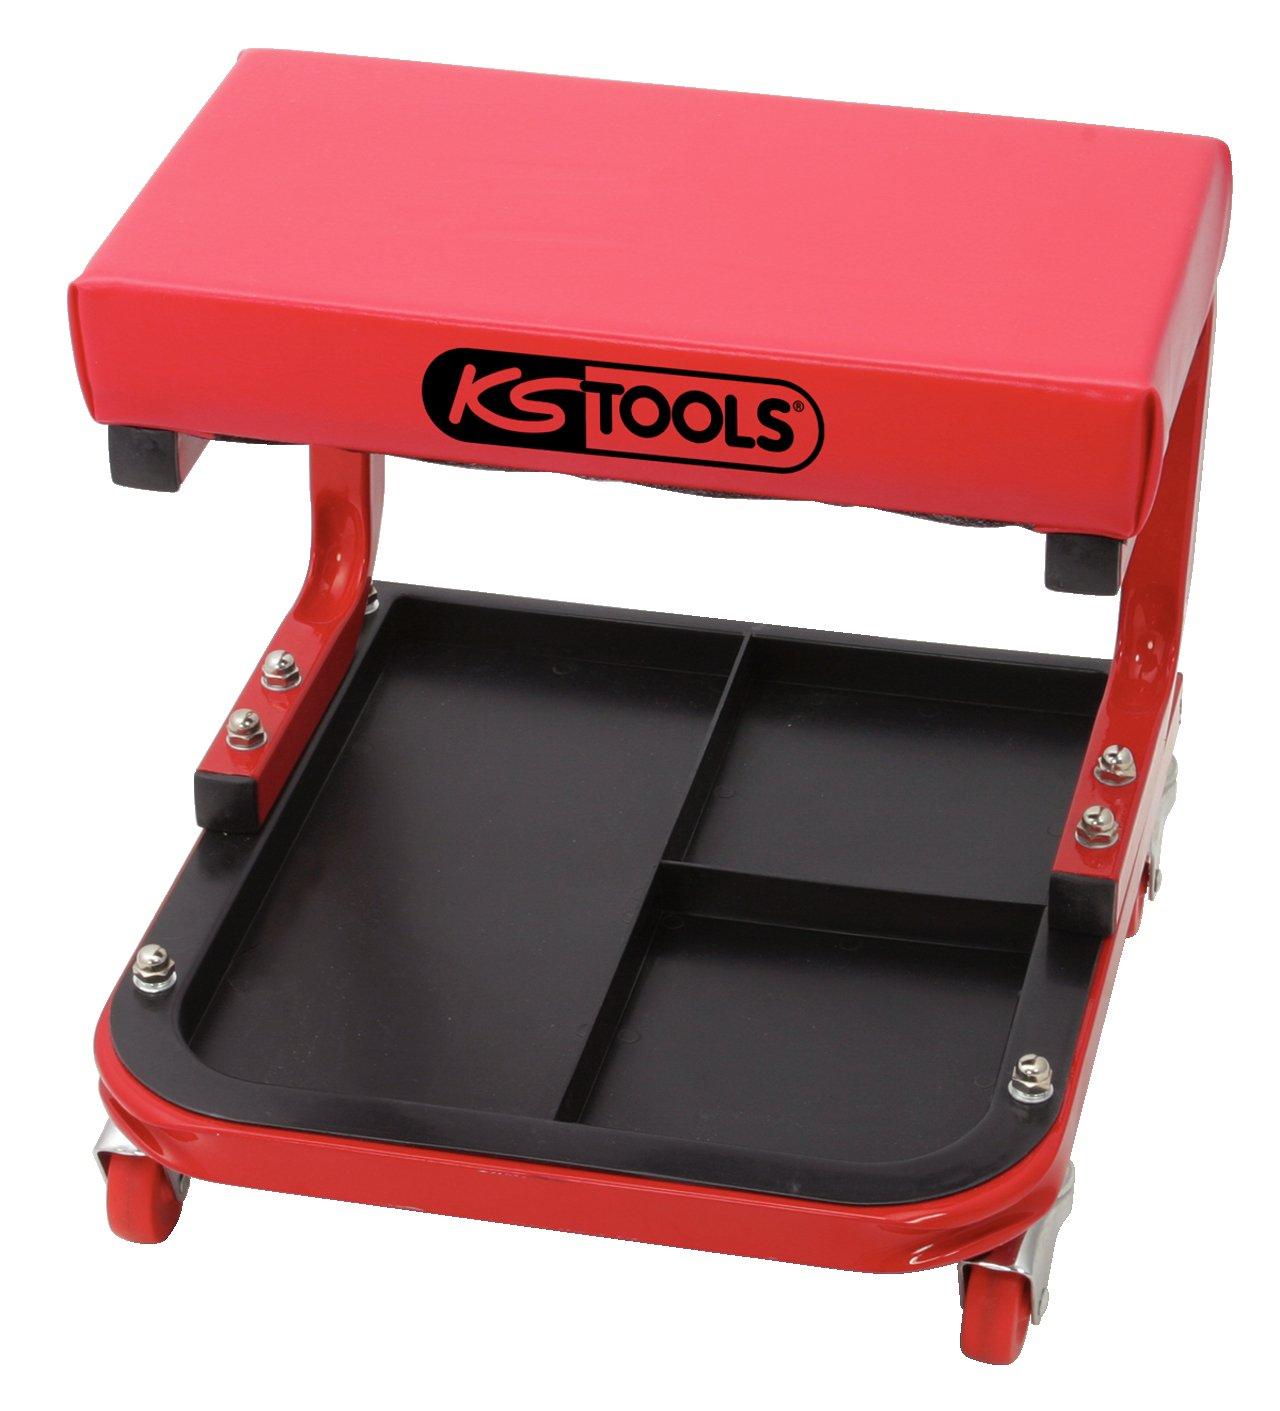 KS Tools 500.8020 Taburete de taller (tamaño: 440 x 360 x 360 mm), 440mm